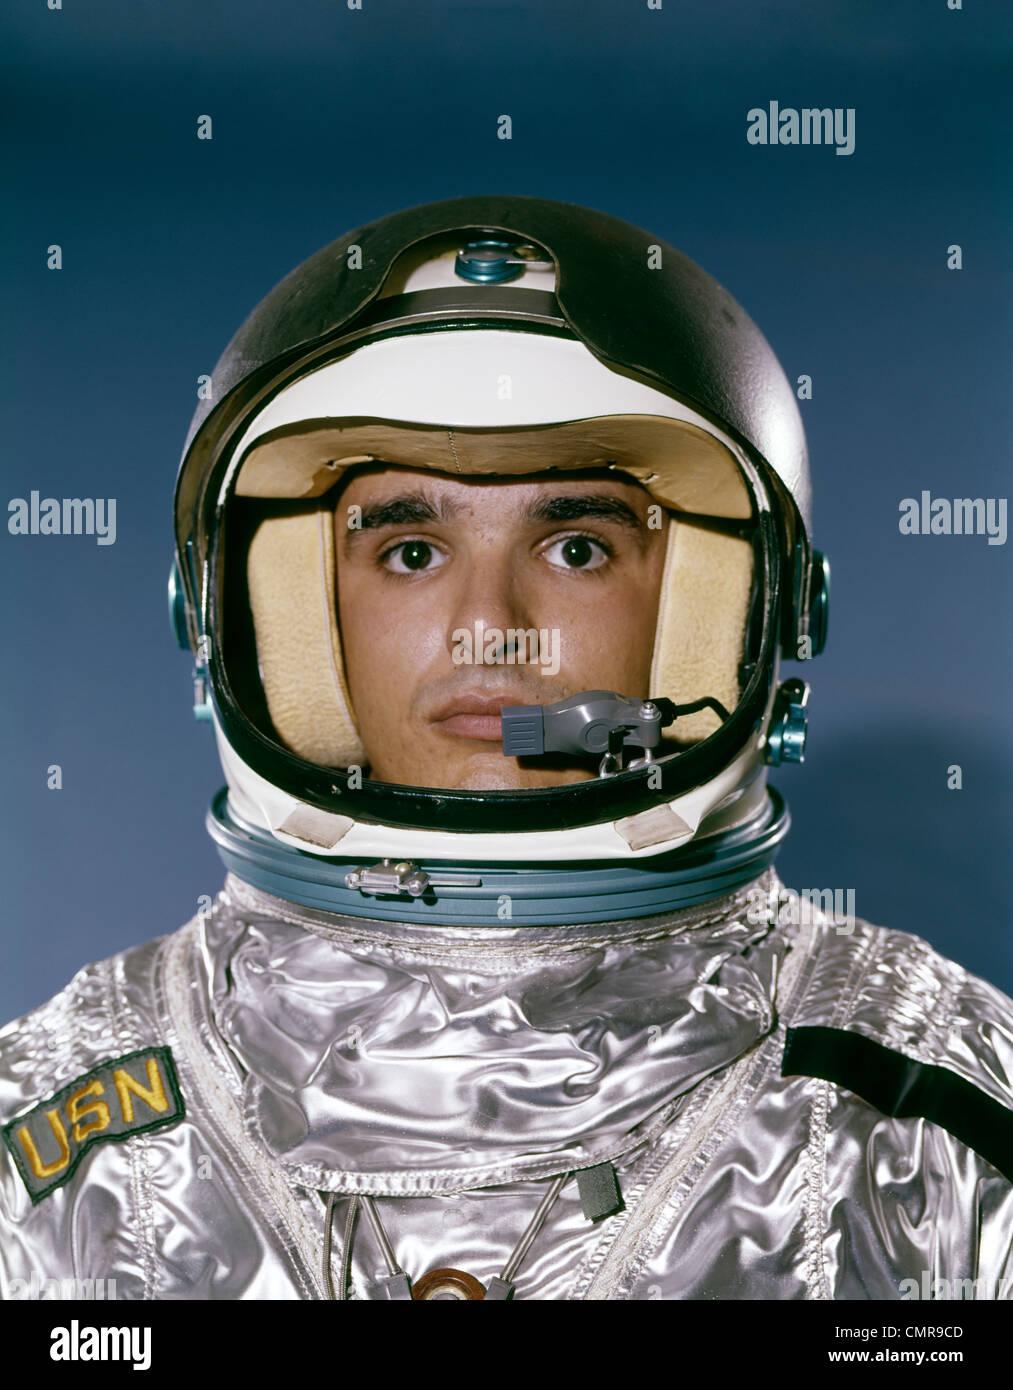 1960 Retrato hombre traje espacial astronauta Imagen De Stock